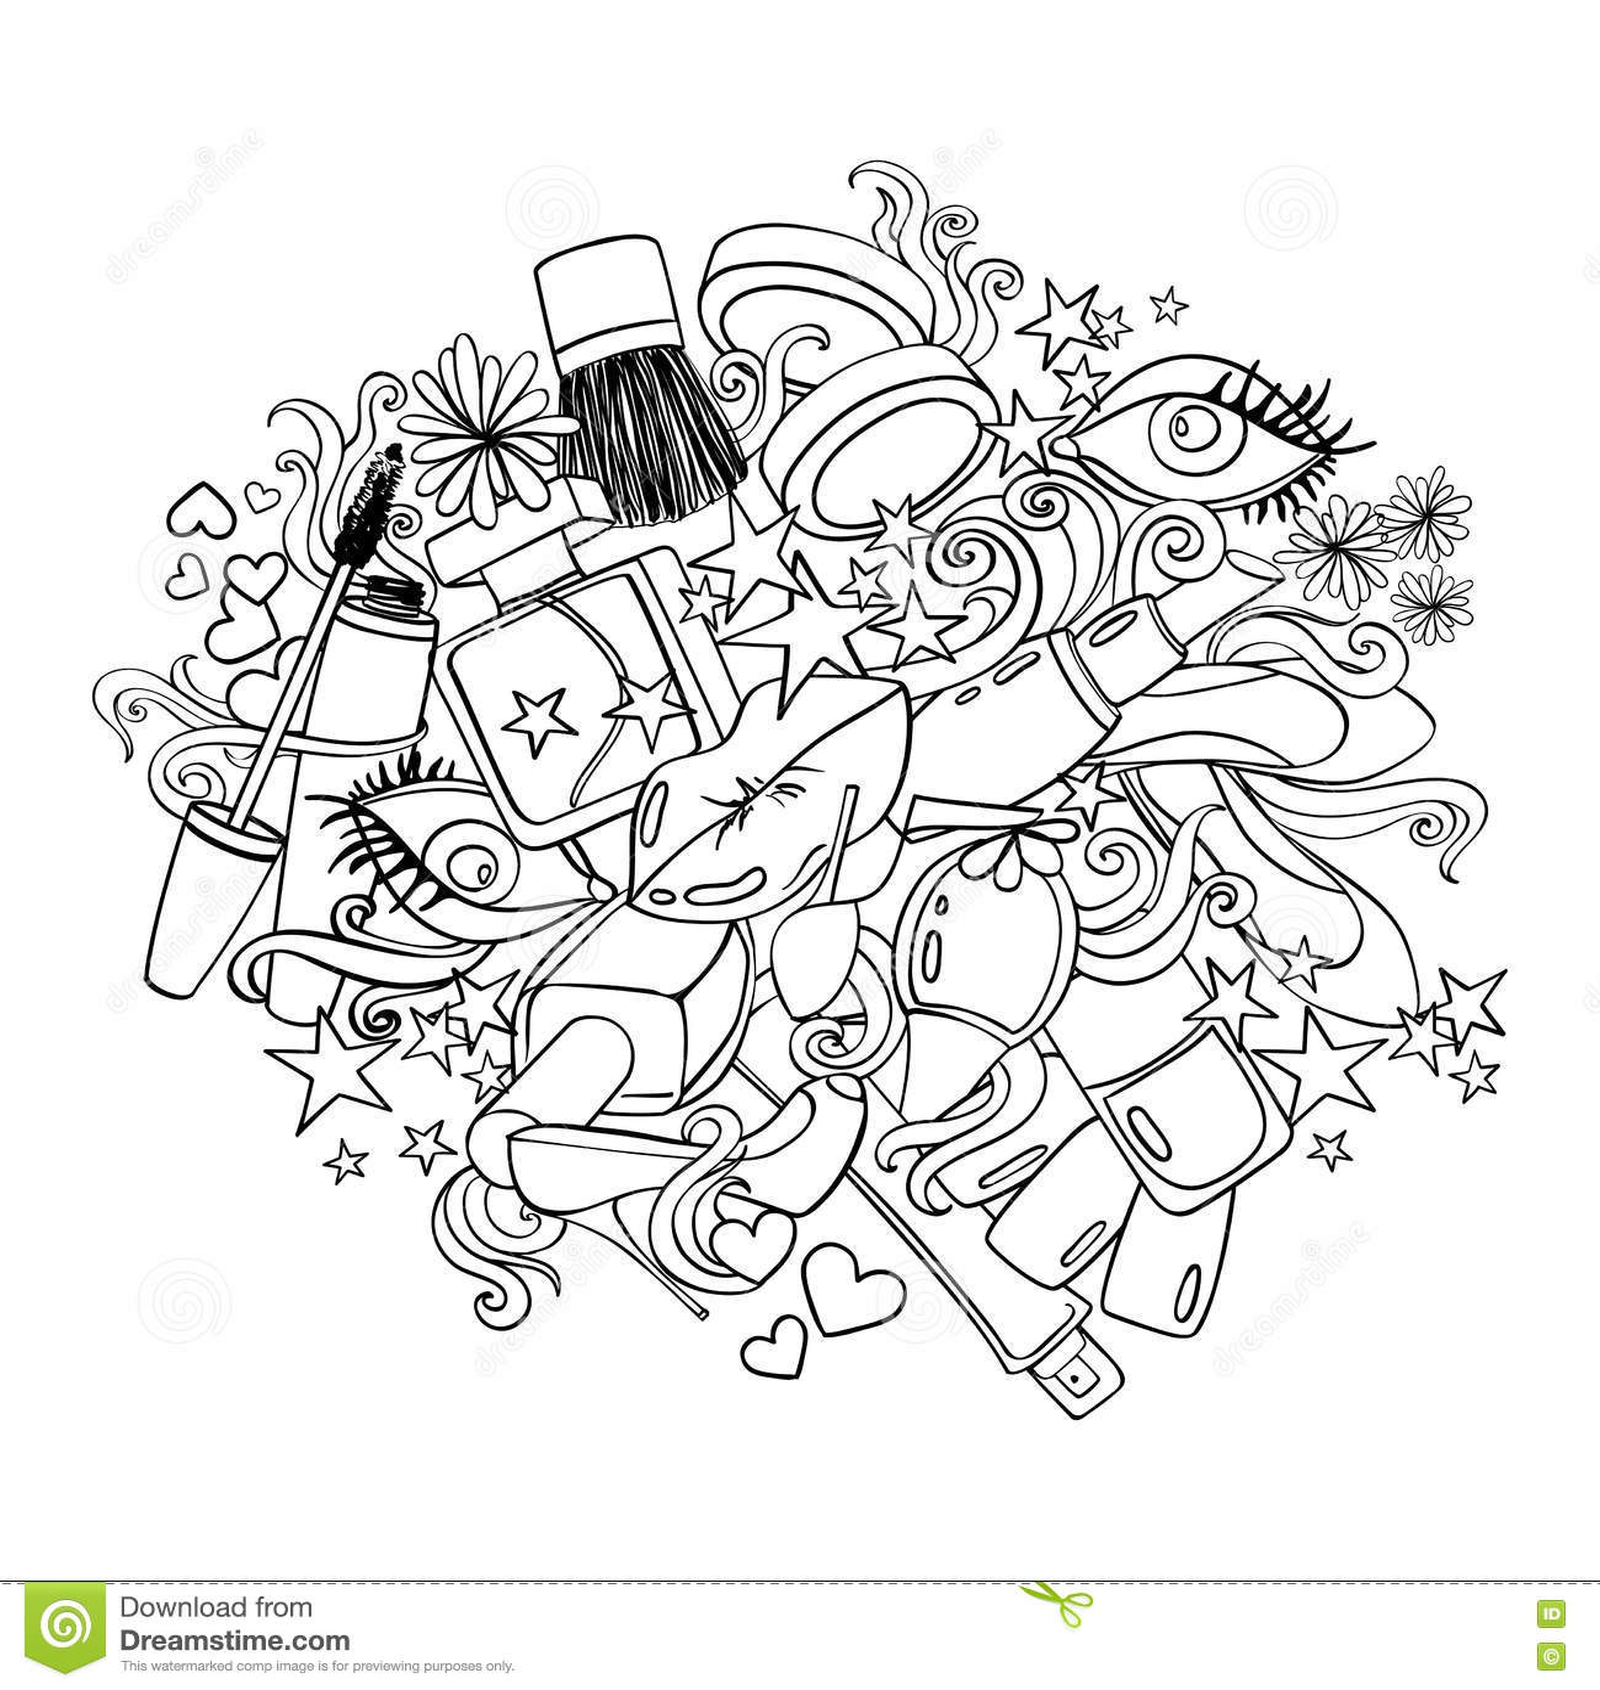 Sketch Cartoon Illustration With Decorative Cosmetics